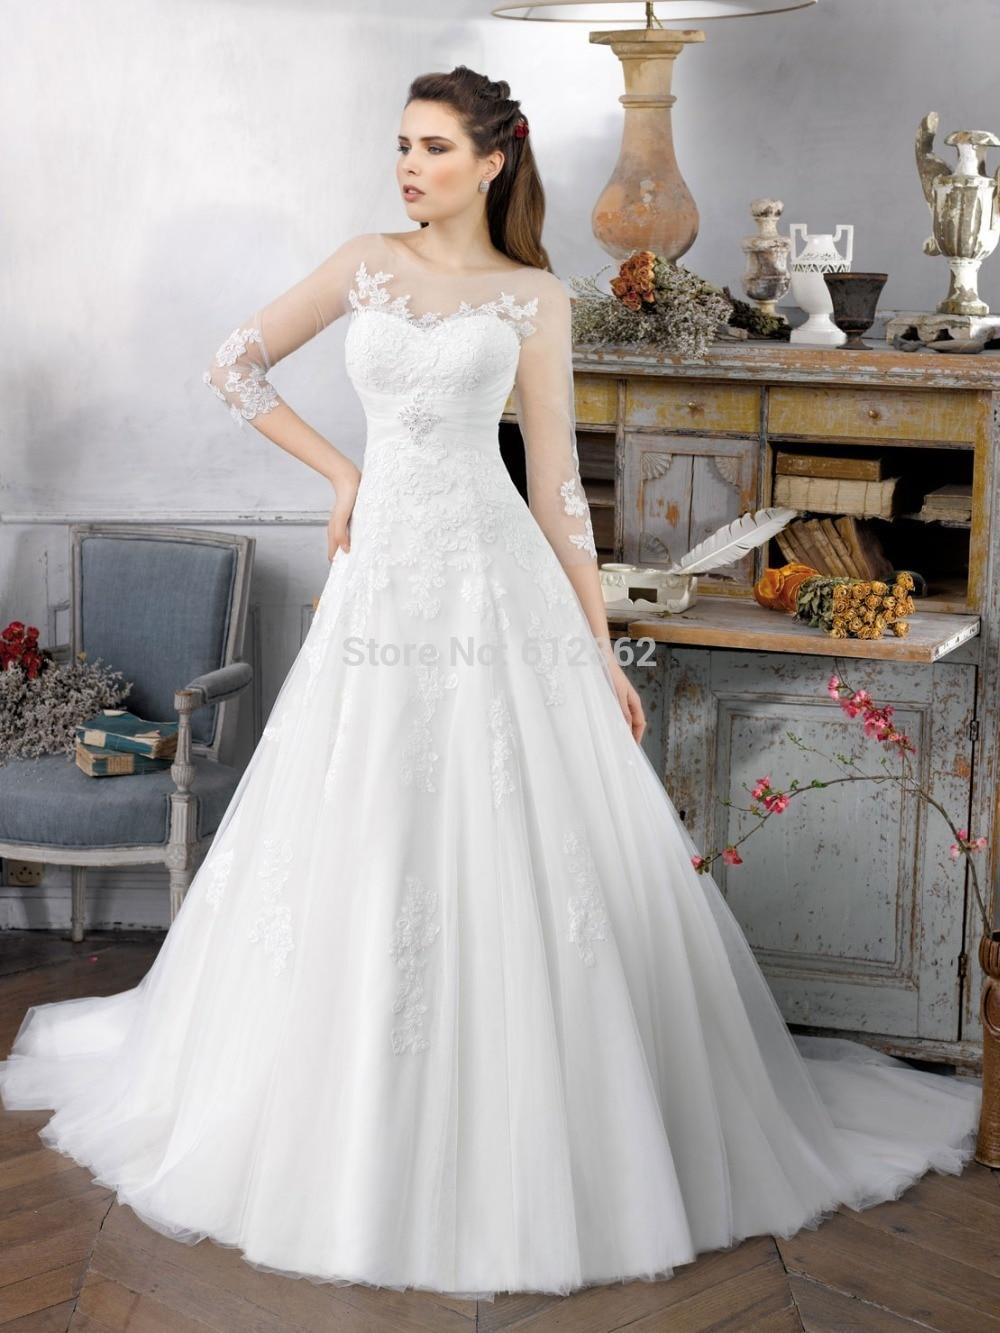 inexpensive modest wedding dresses modest wedding dresses cheap Inexpensive Modest Wedding Dresses 32